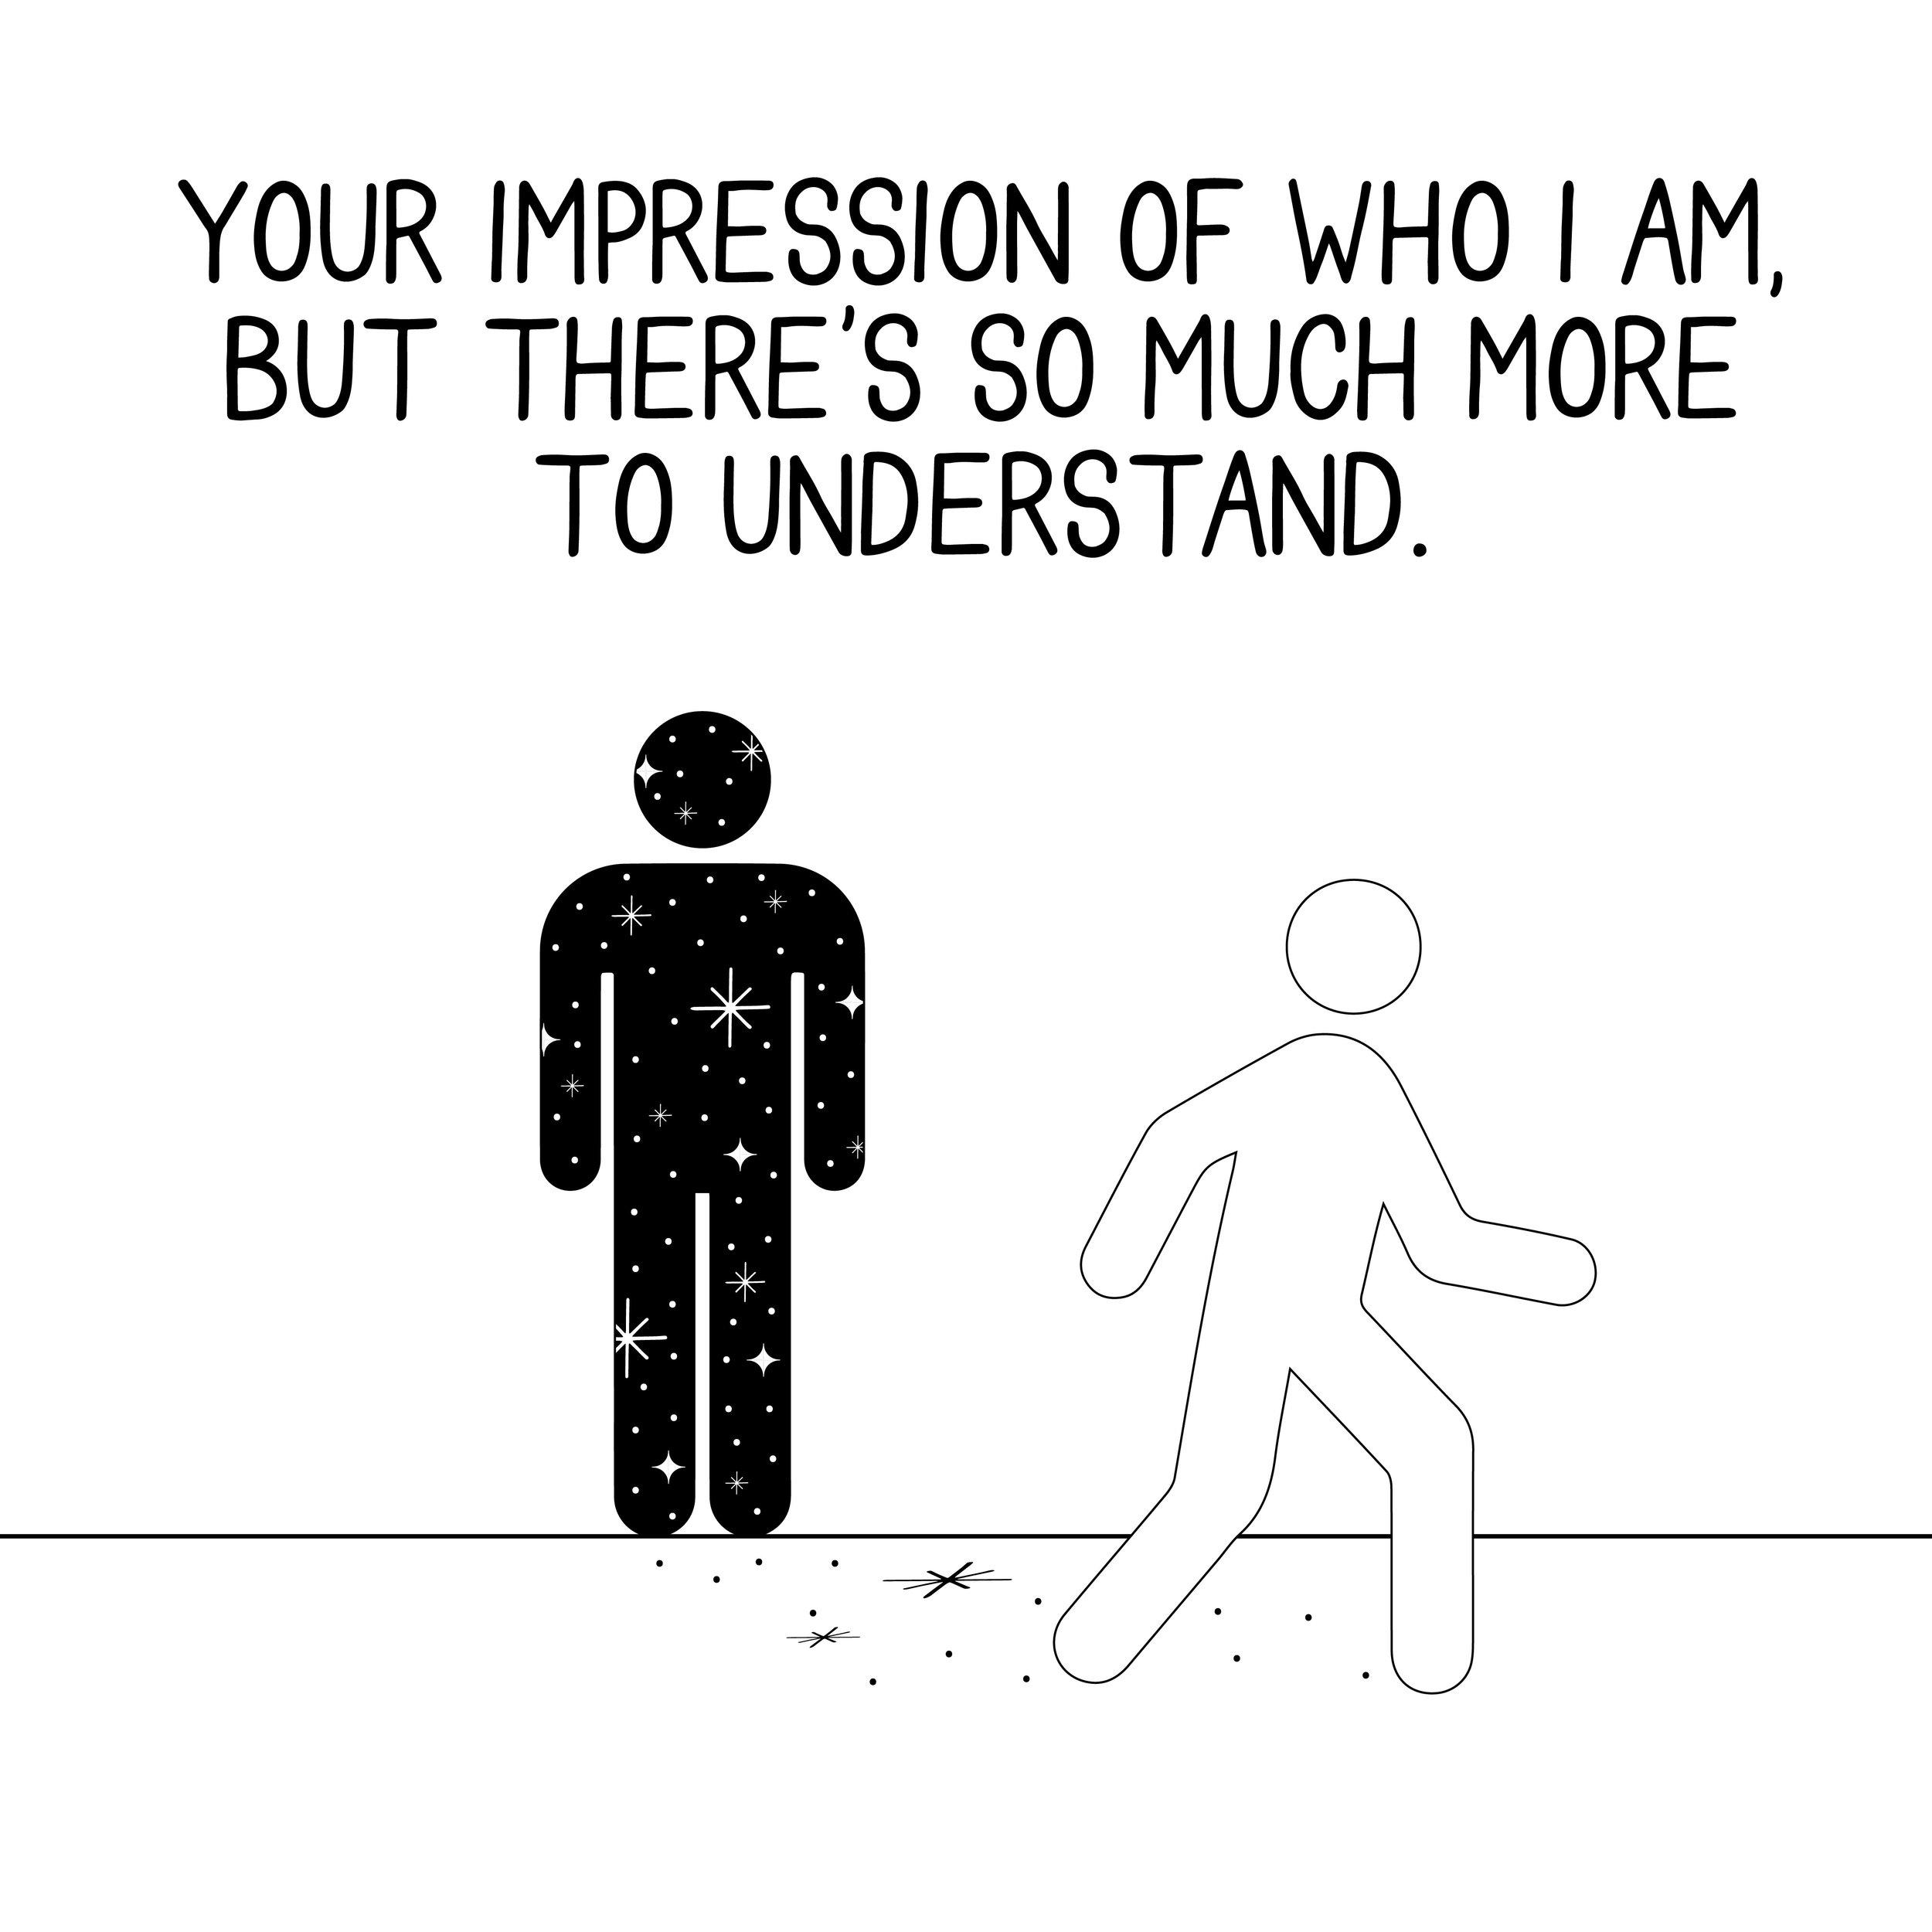 impression-01.jpg